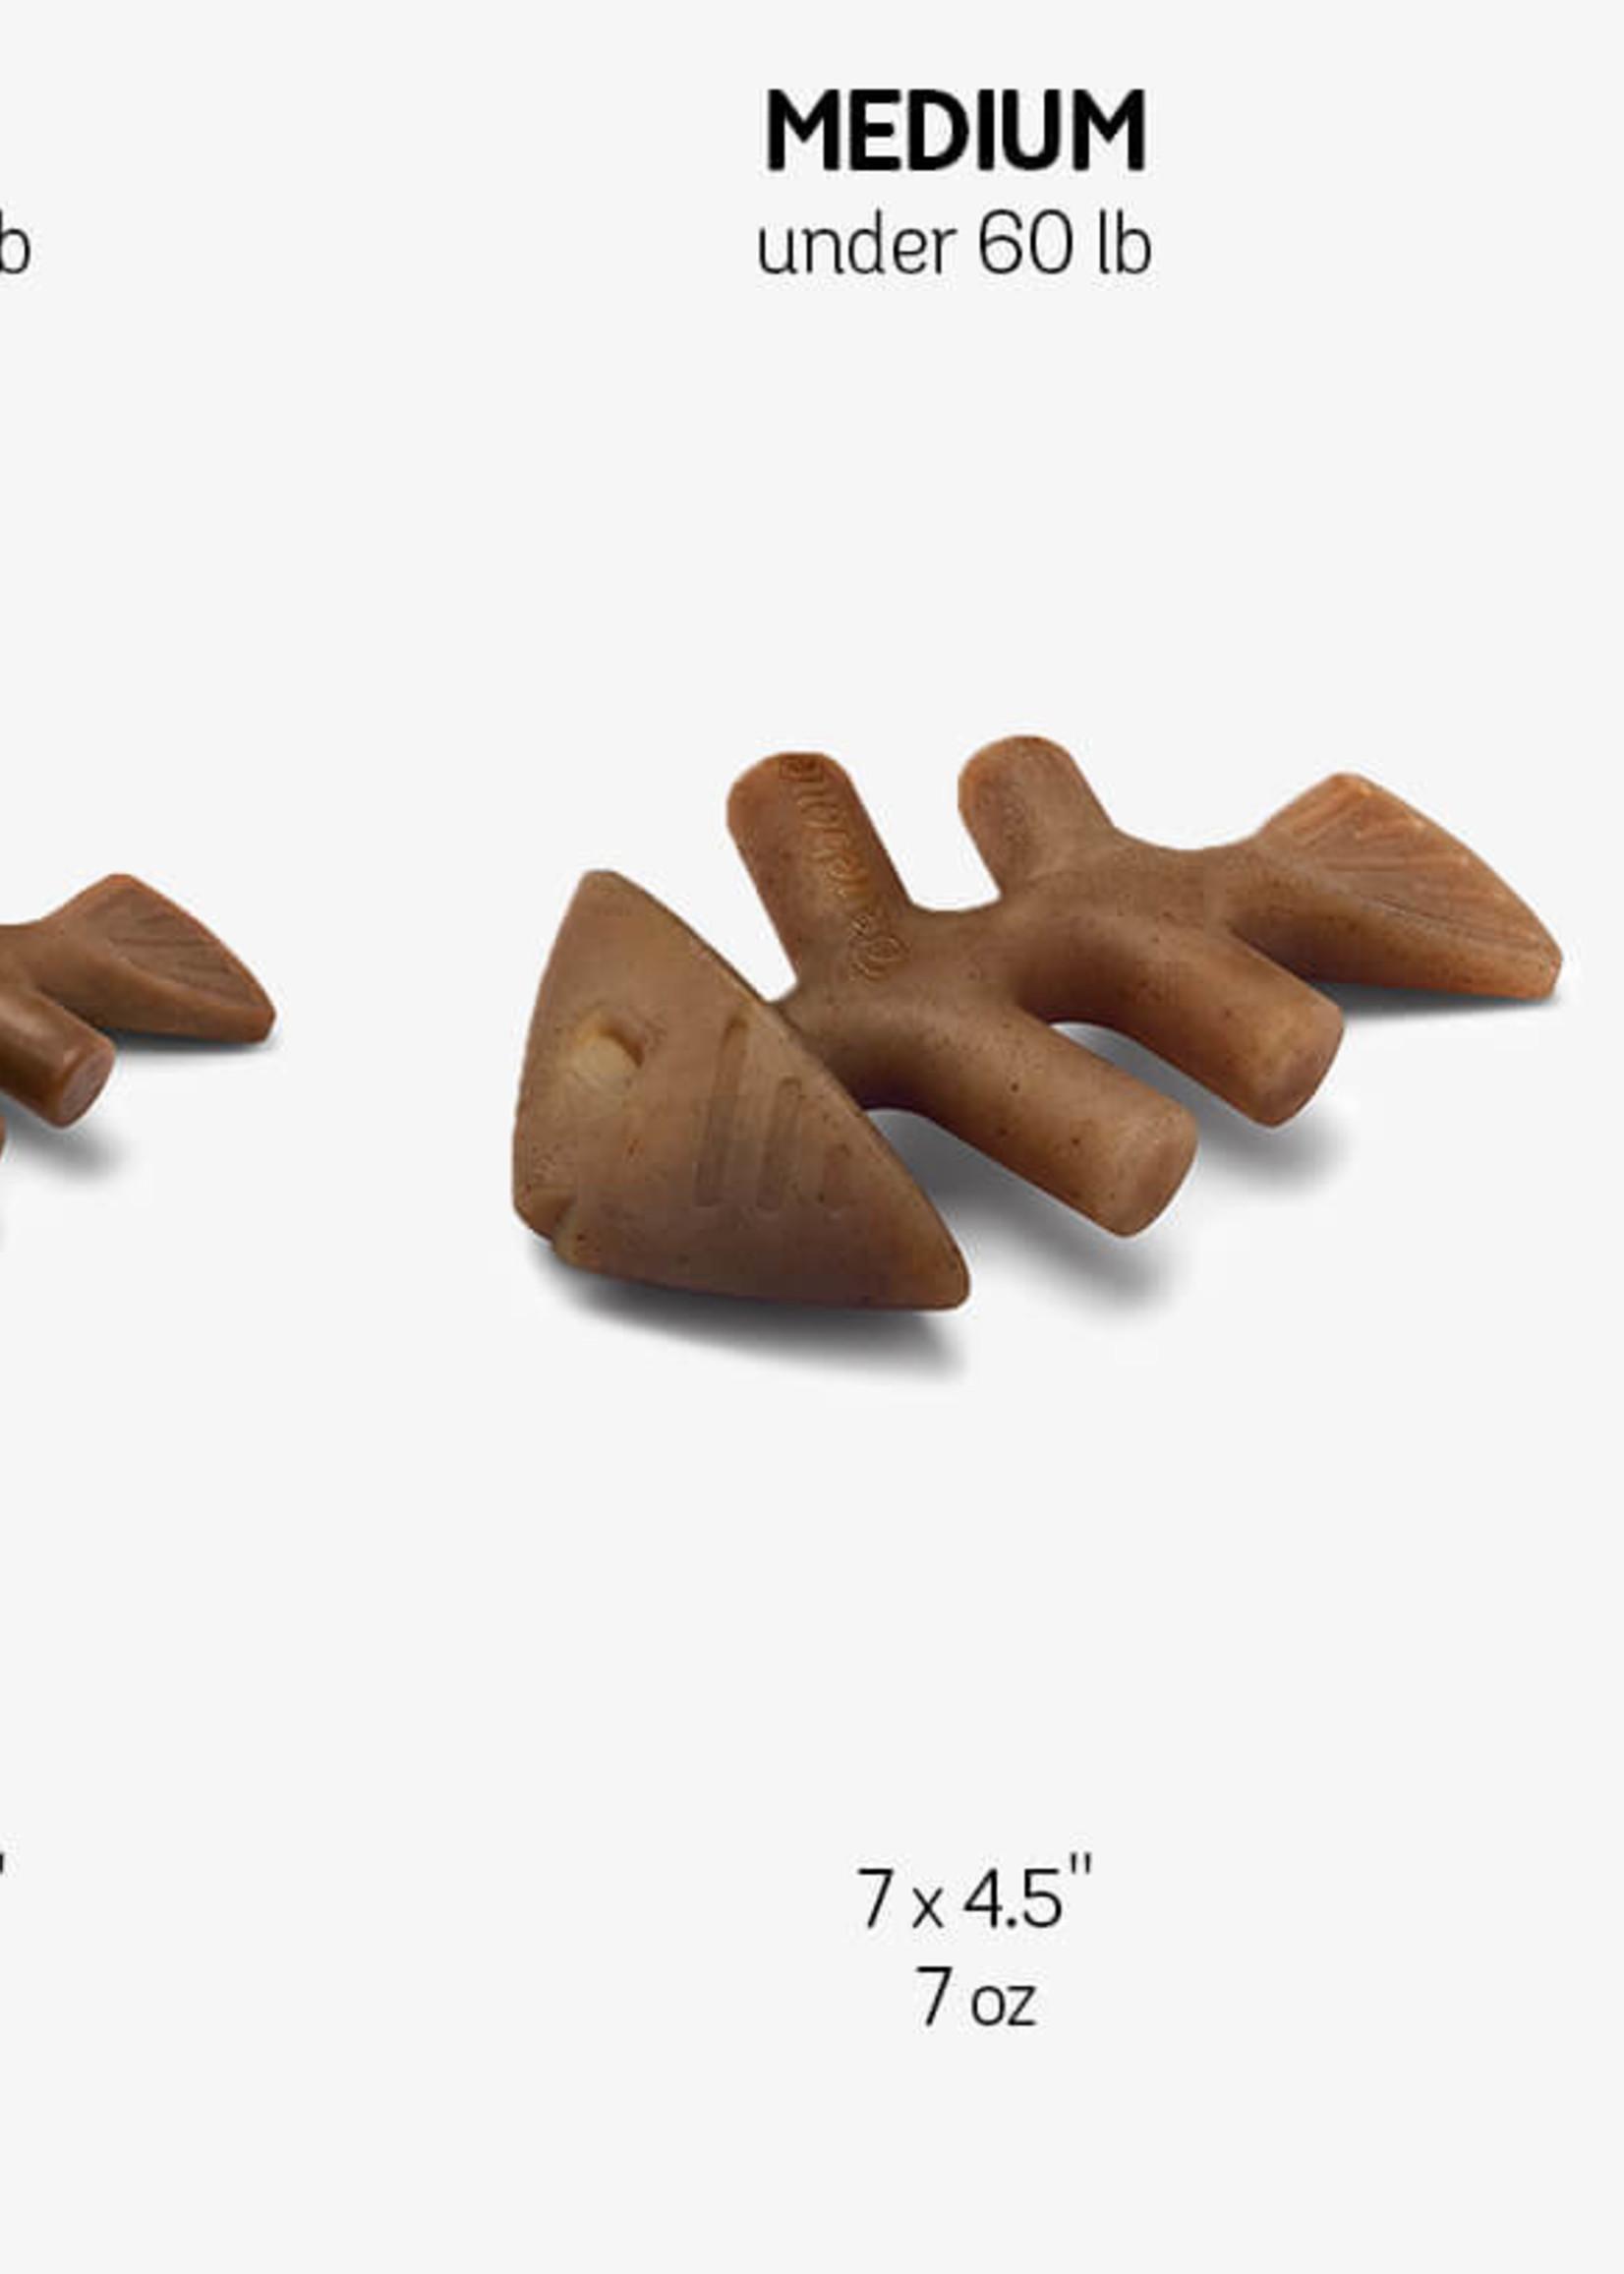 BENEBONE Benebone Fishbone Medium